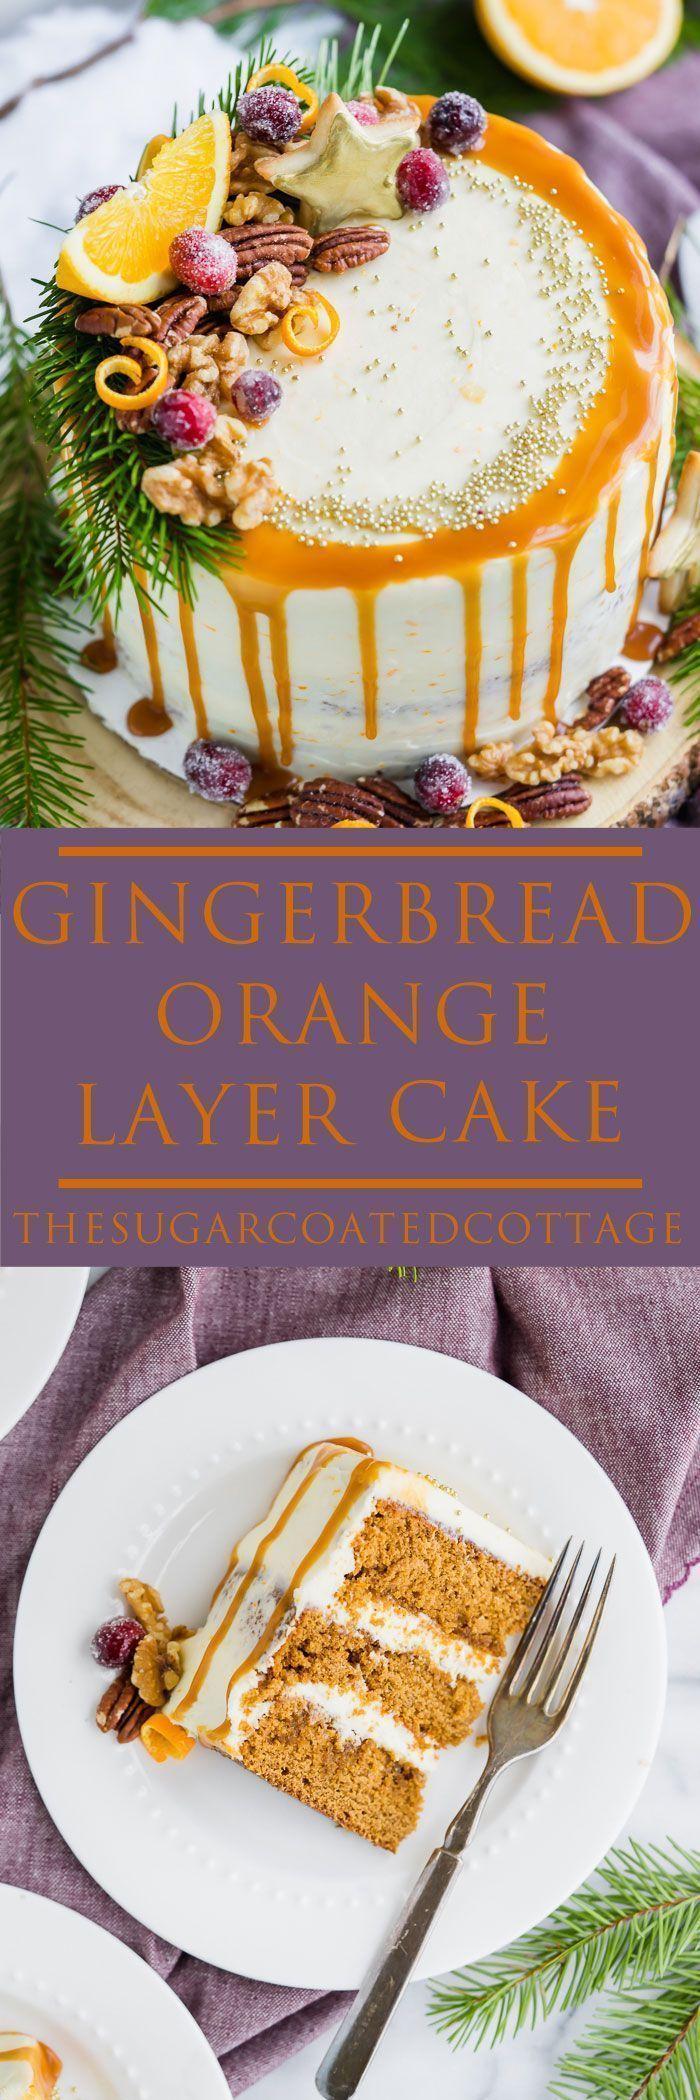 Gingerbread Orange Layer Cake 3cd08174535d22772f29676eea533bb4